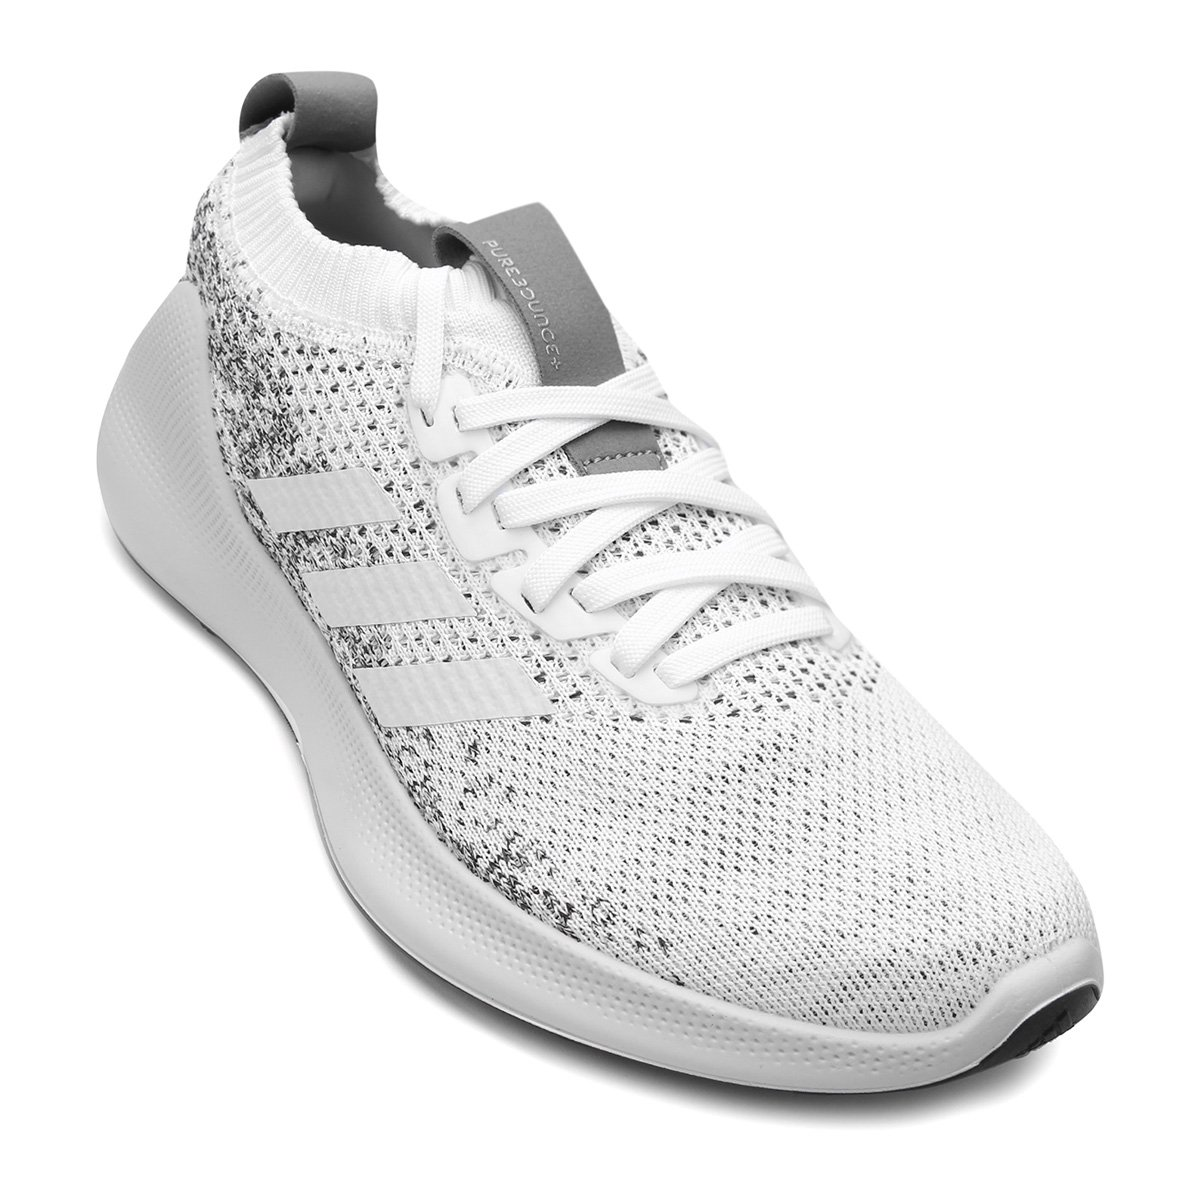 Tênis Adidas Purebounce+ Masculino - Branco e Cinza - Compre Agora ... 4e32c9d4550fa